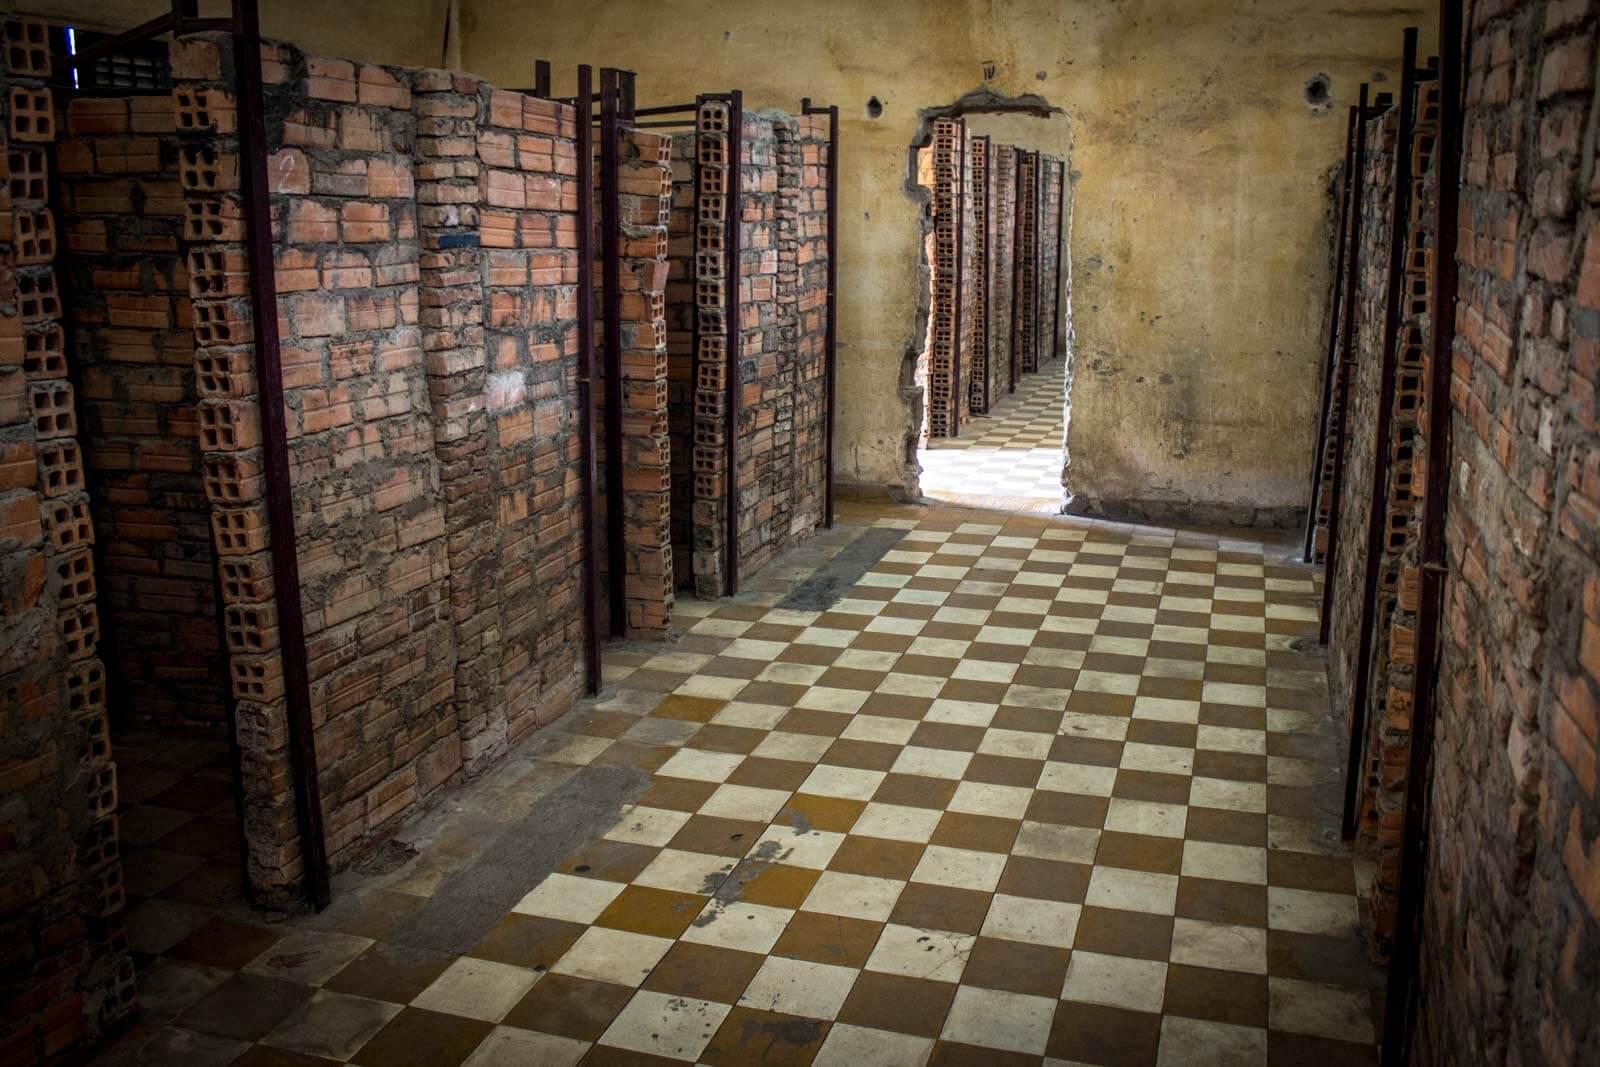 Камеры тюрьмы безопасности 21